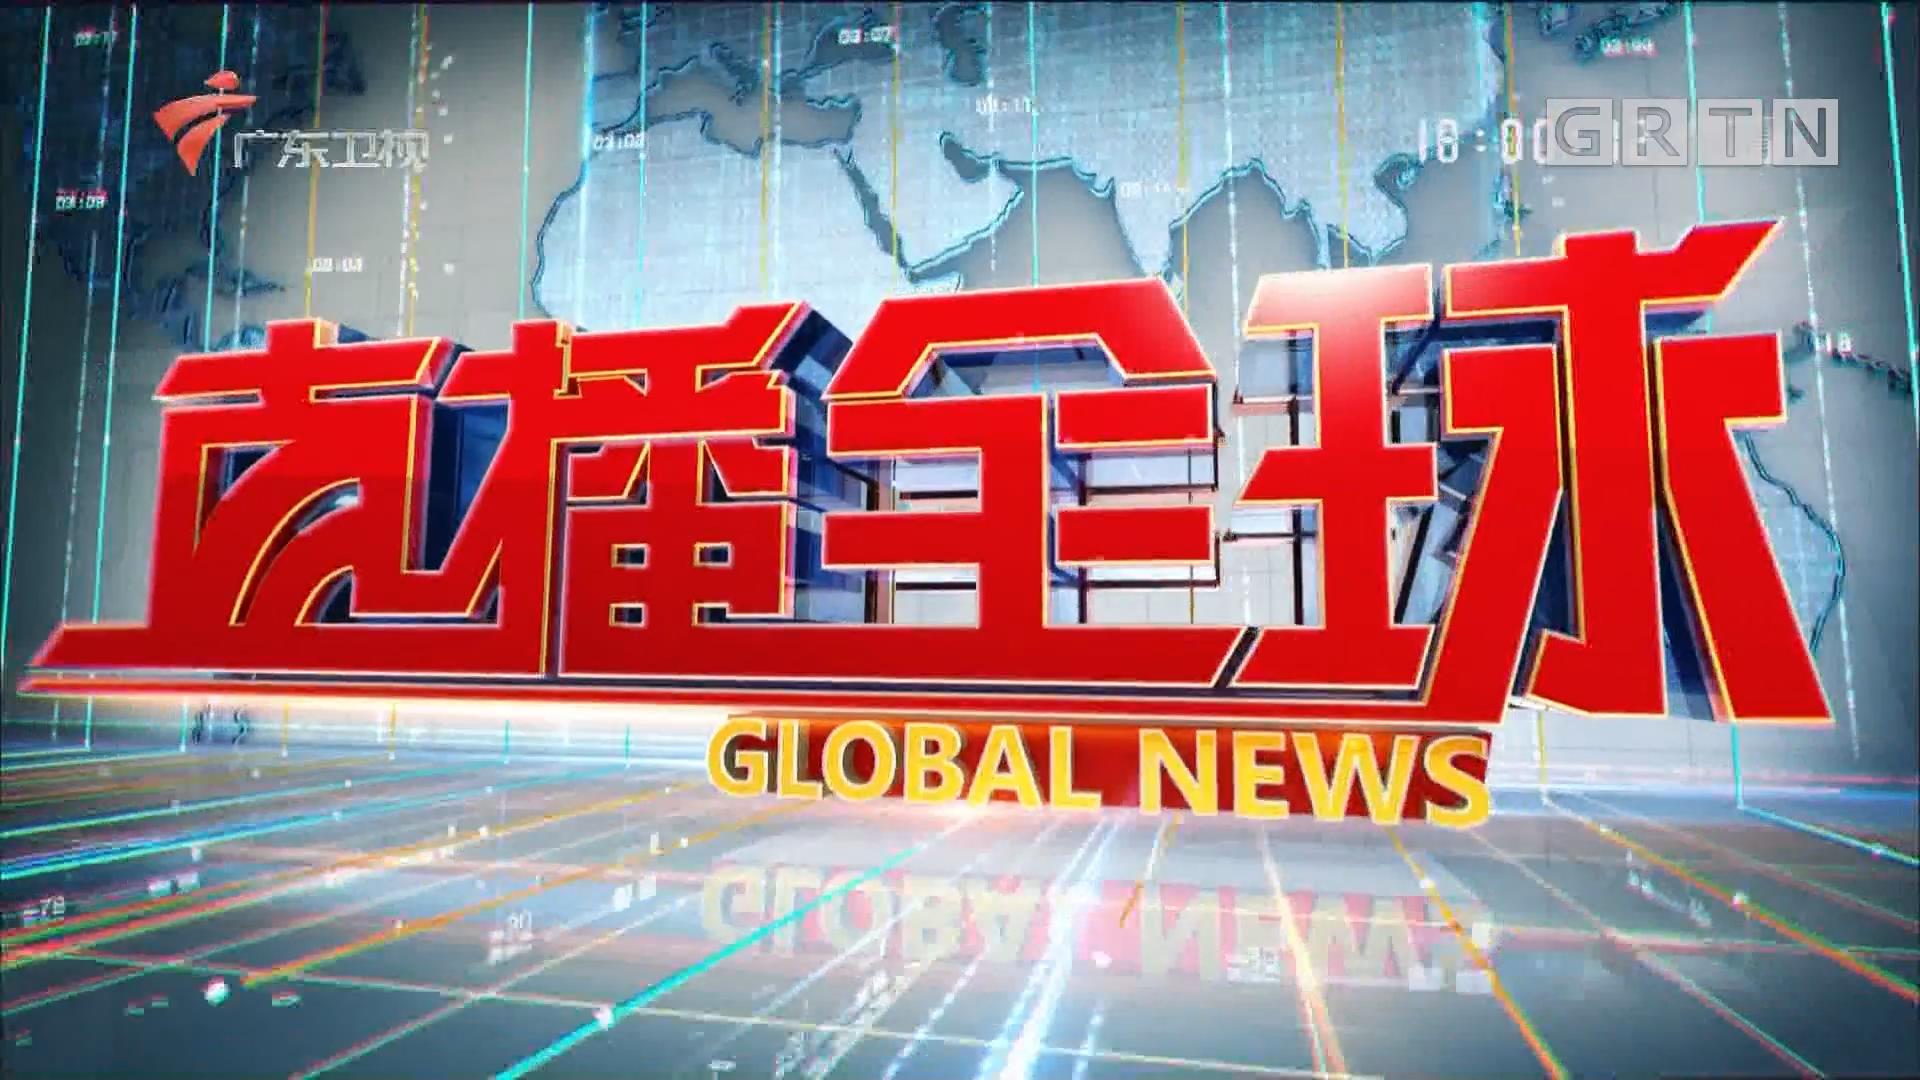 [HD][2019-05-16]直播全球:亚洲文明周活动今启动:中外游客领略亚洲各国风情